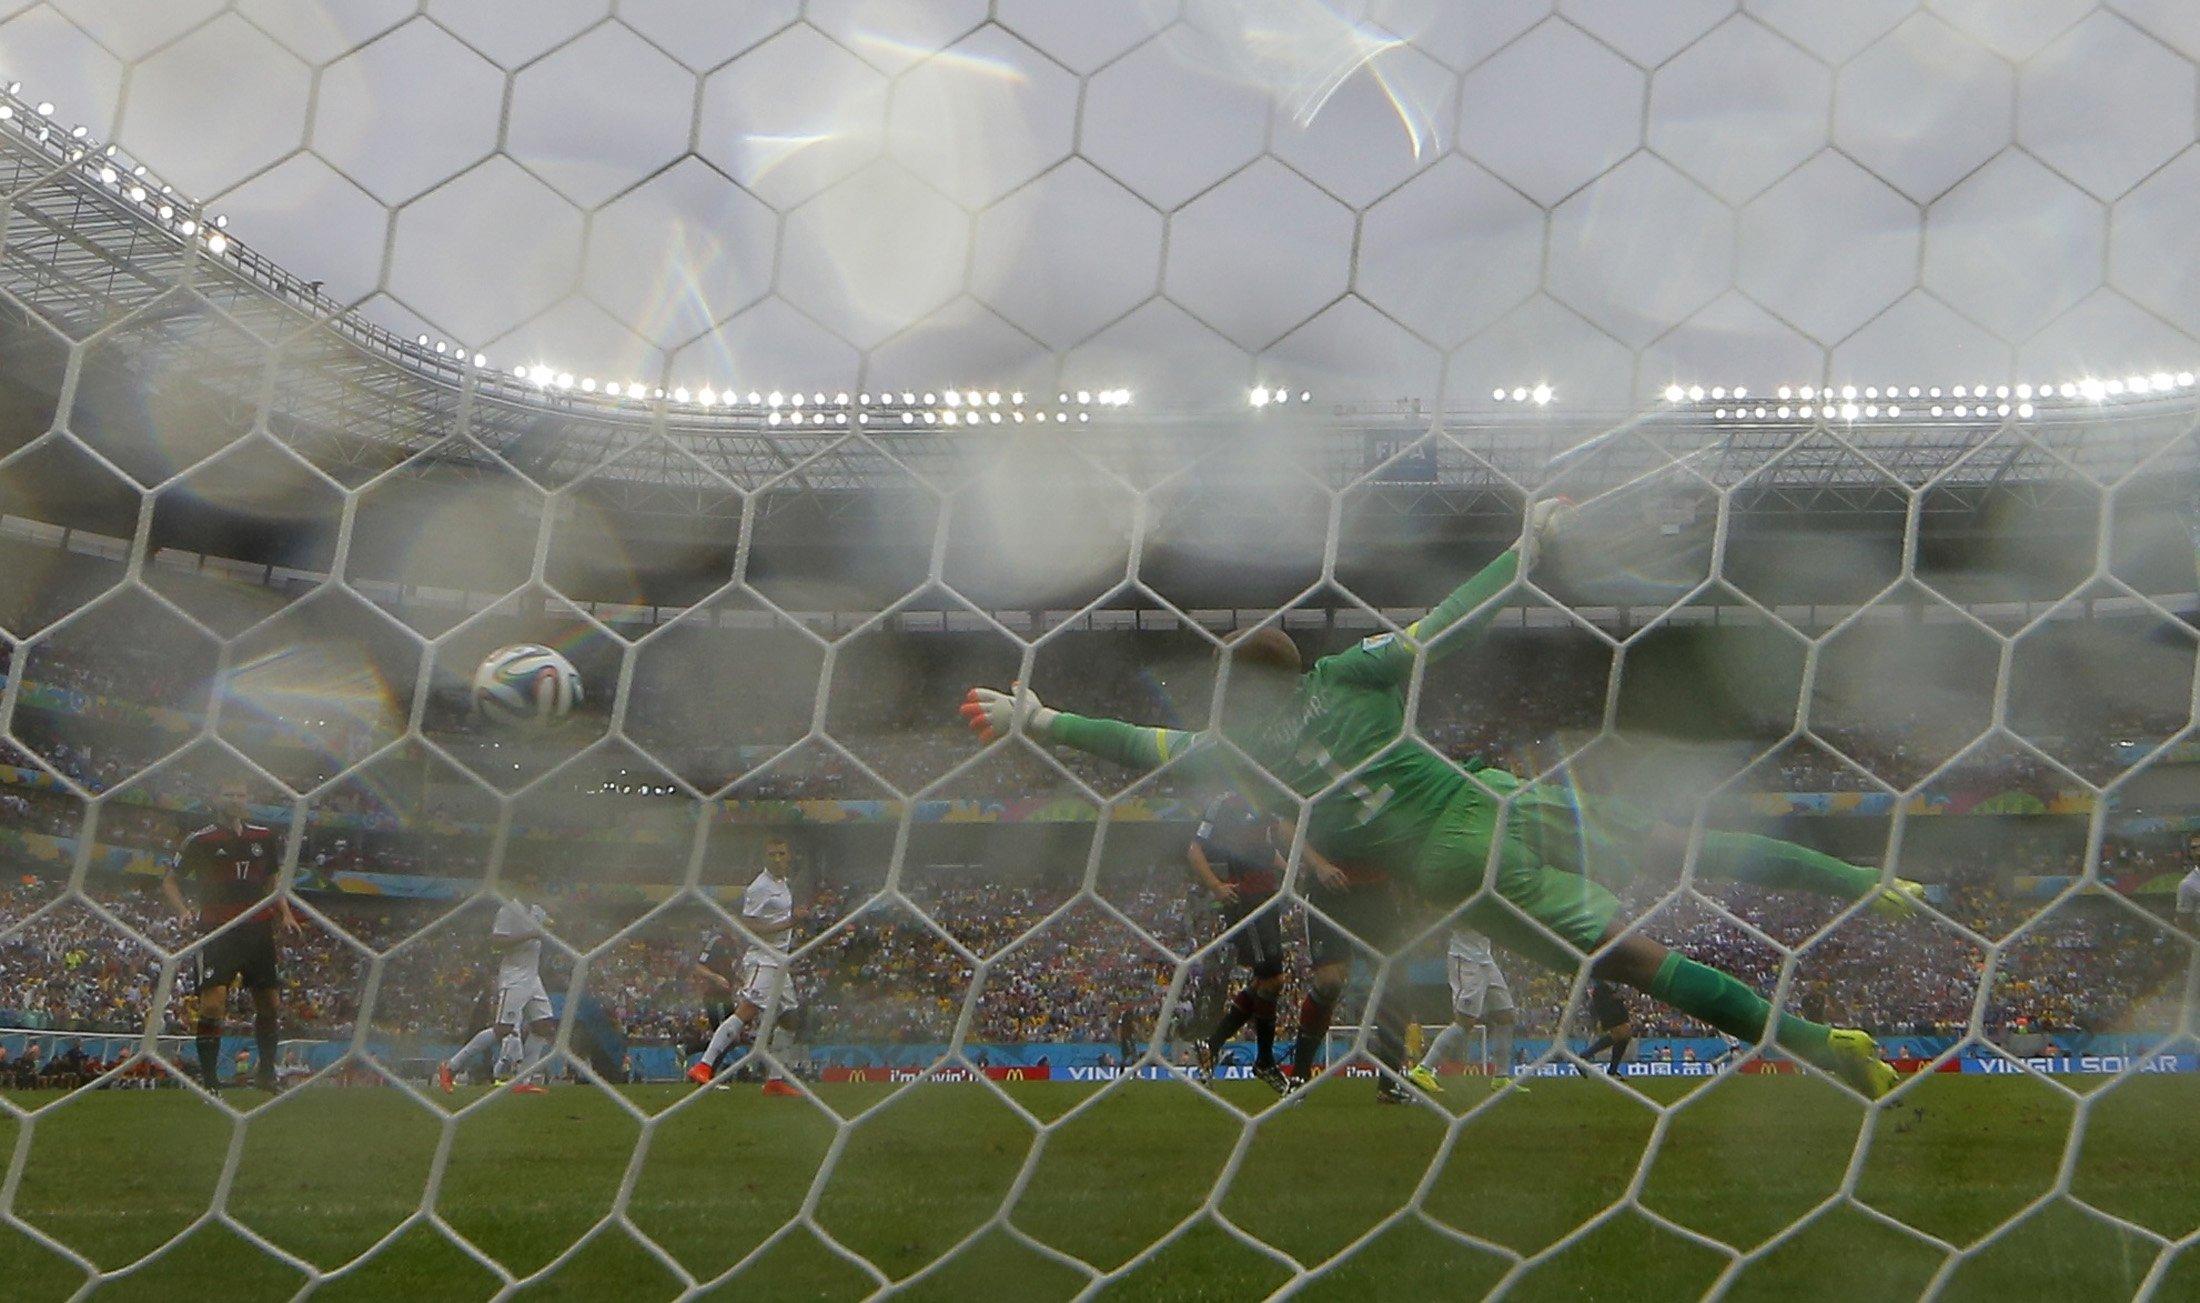 Germany's Thomas Mueller scores past goalkeeper Tim Howard of the U.S. at the Pernambuco arena in Recife June 26, 2014.